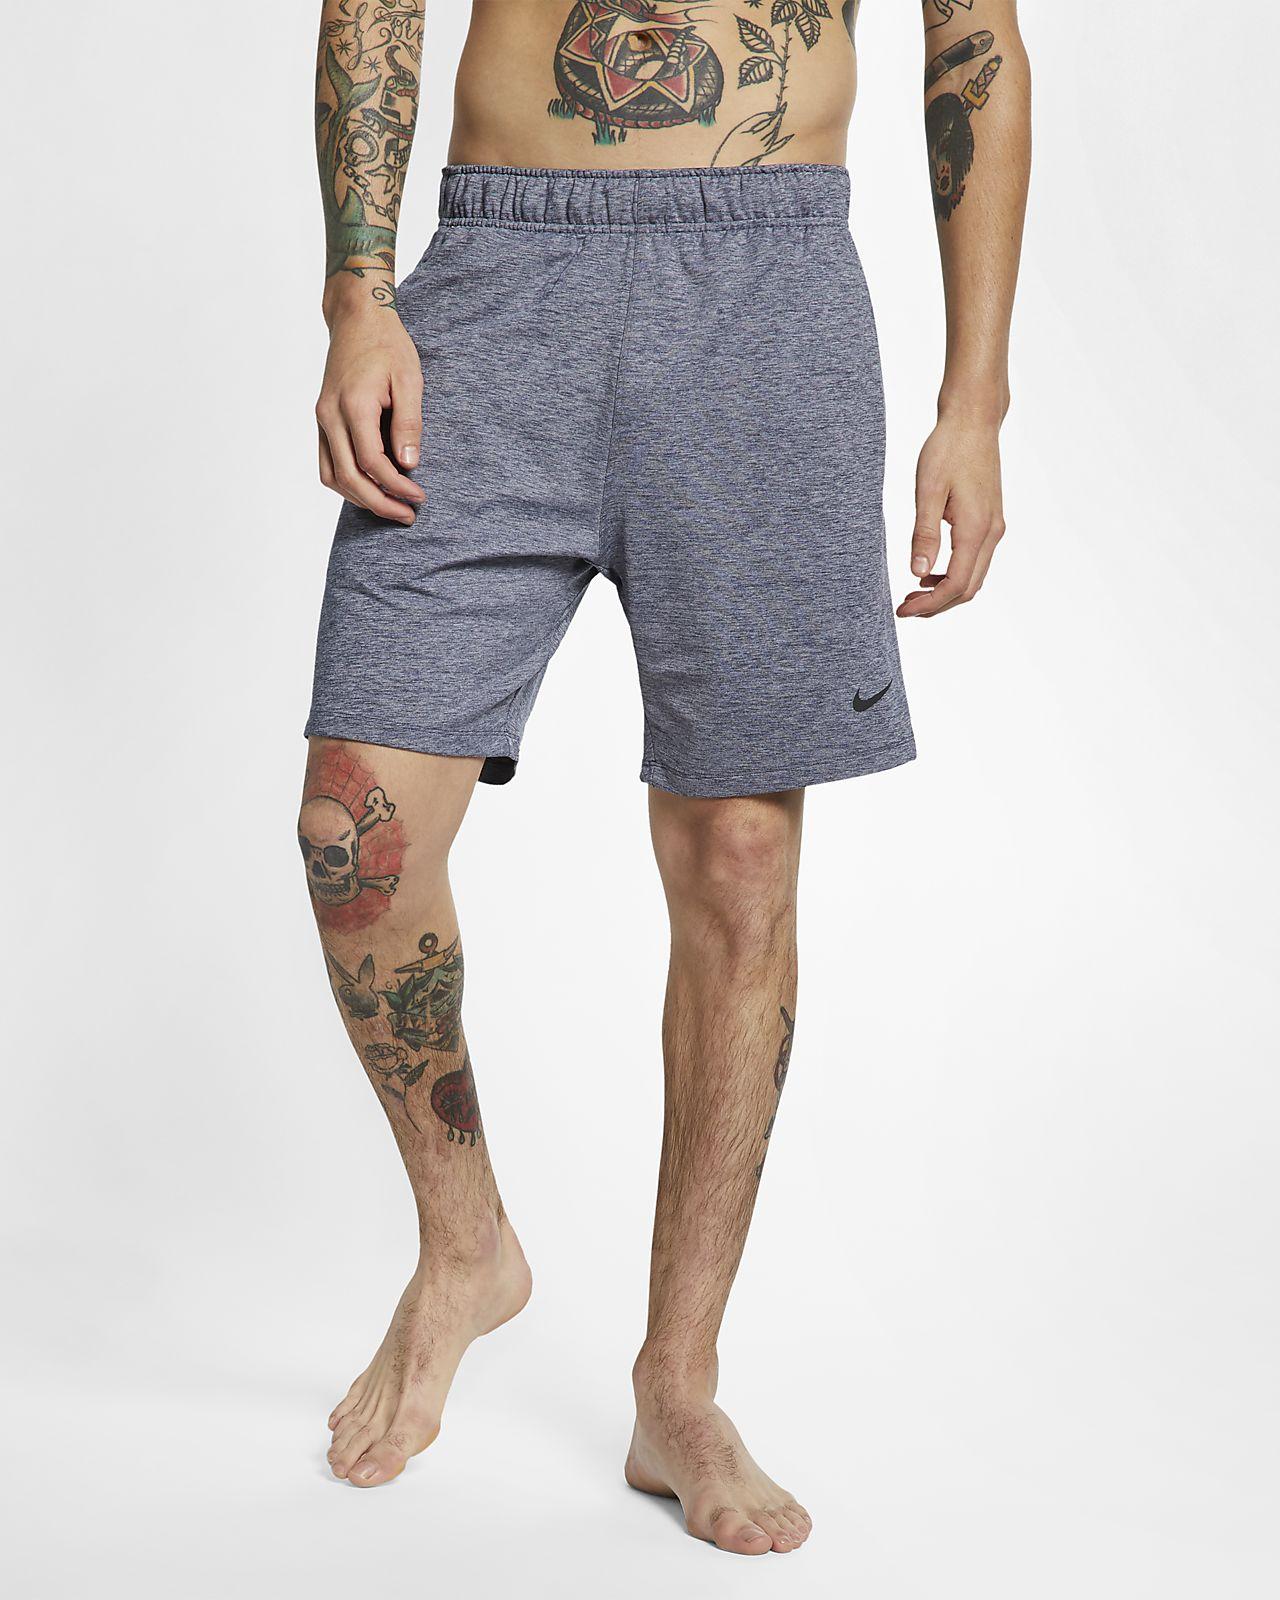 Nike Dri-FIT 男款瑜伽訓練短褲